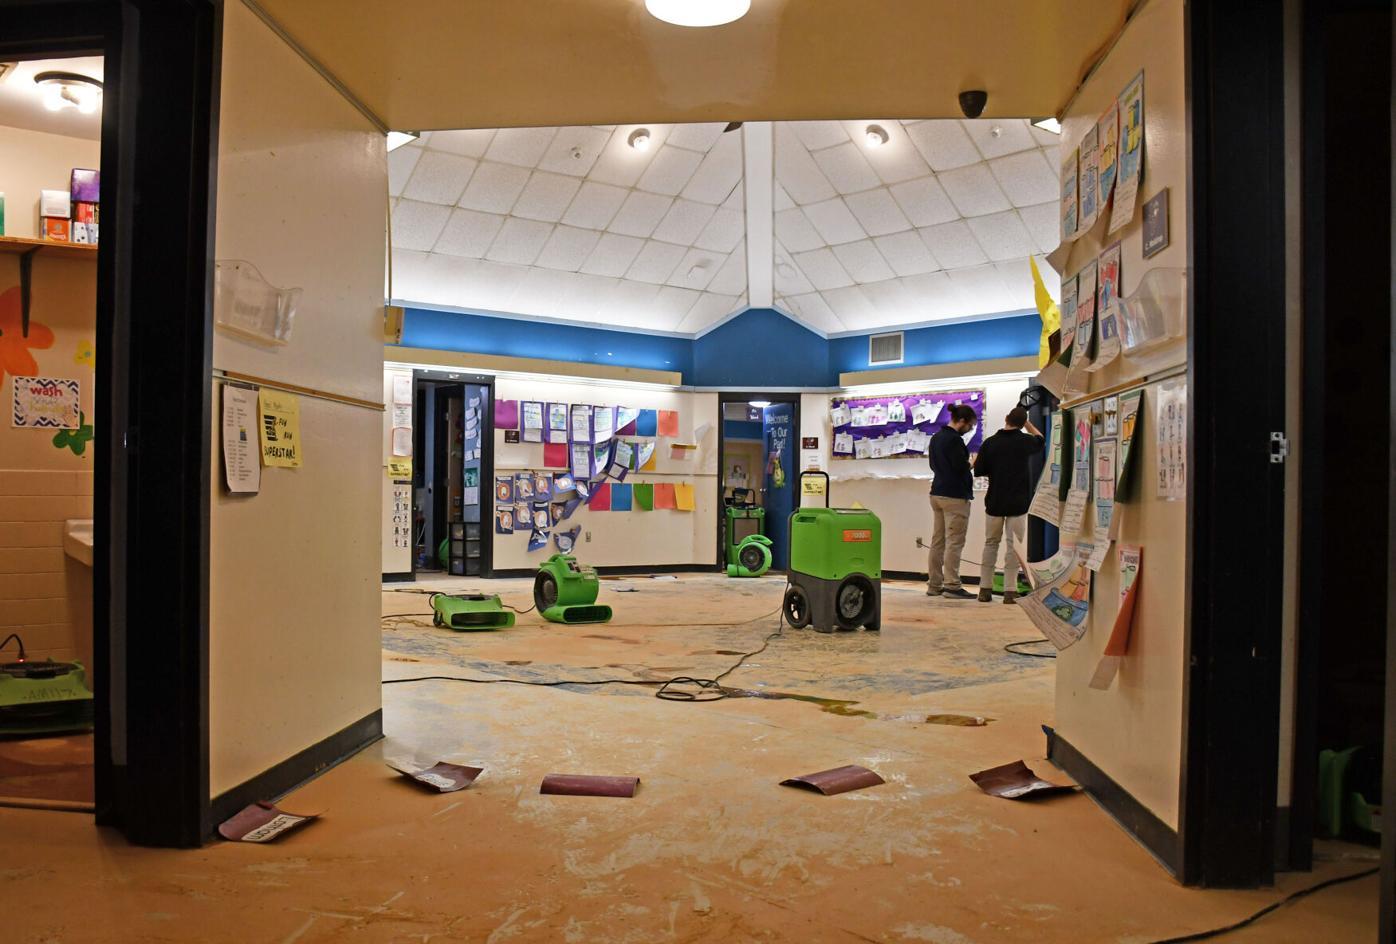 0505 school damage update3018.JPG